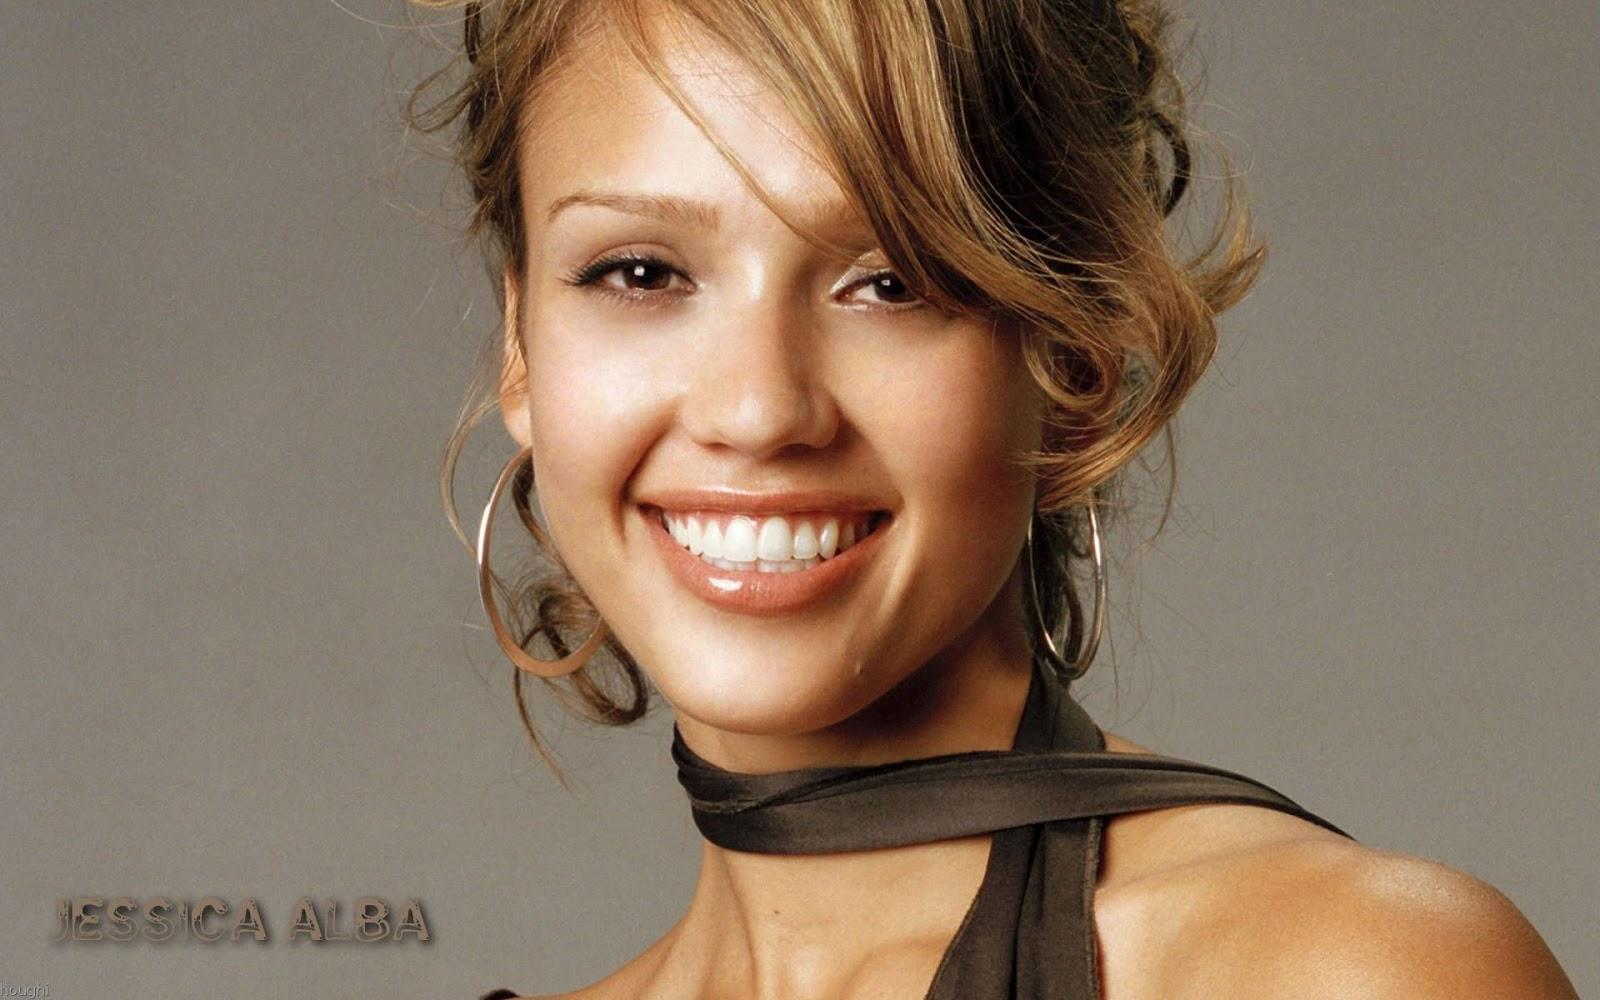 http://3.bp.blogspot.com/-0zz1eJ-6WKg/T2IhriaecSI/AAAAAAAADGk/_3terXkhKcA/s1600/Jessica+Alba+-+reg+thorpe+%2821%29.jpg